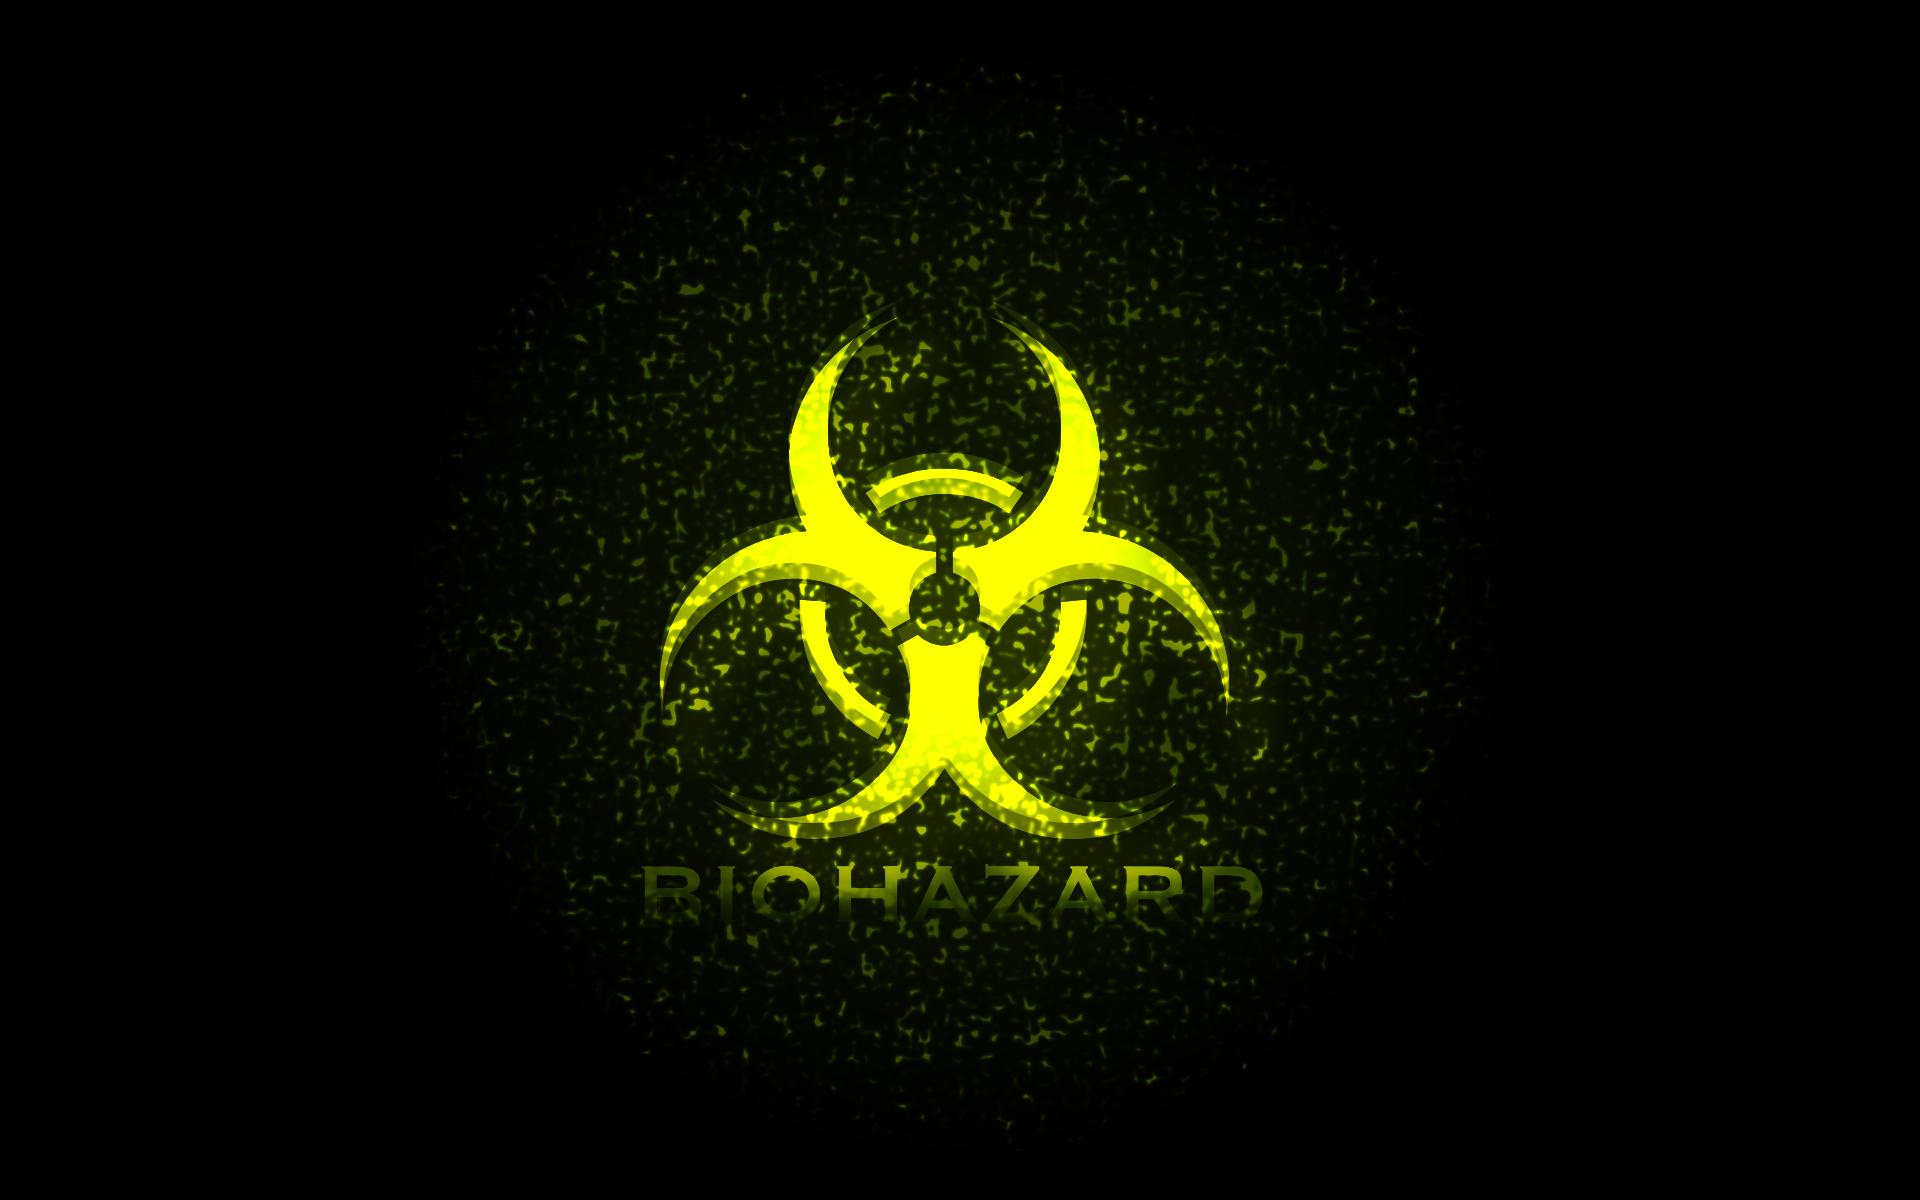 Download Biohazard Symbol Wallpaper 1920x1200 Wallpoper 1920x1200